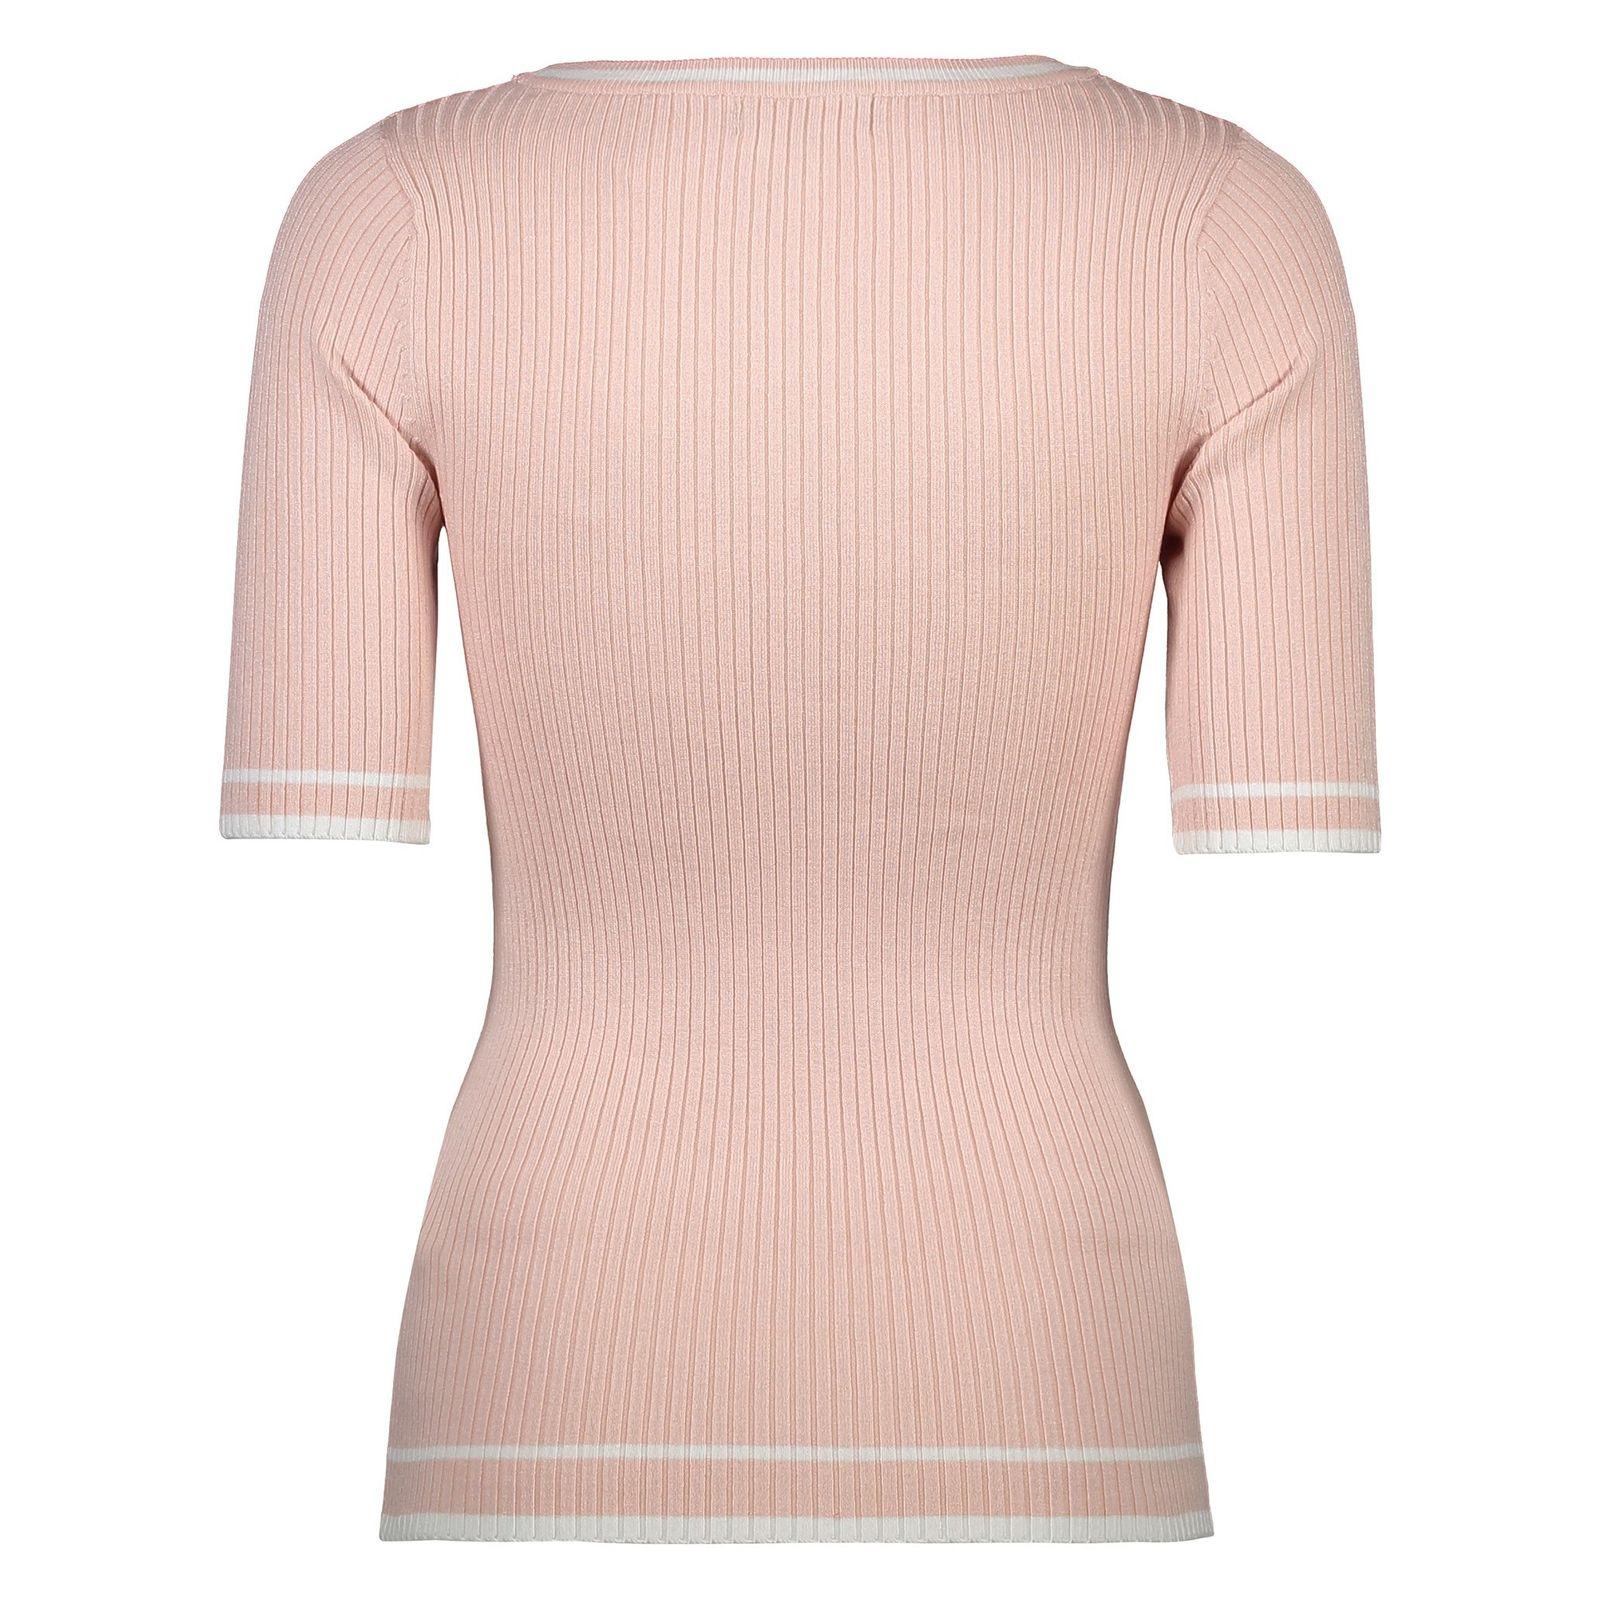 تی شرت ویسکوز یقه گرد زنانه - کالکشن - کرم صورتي - 2